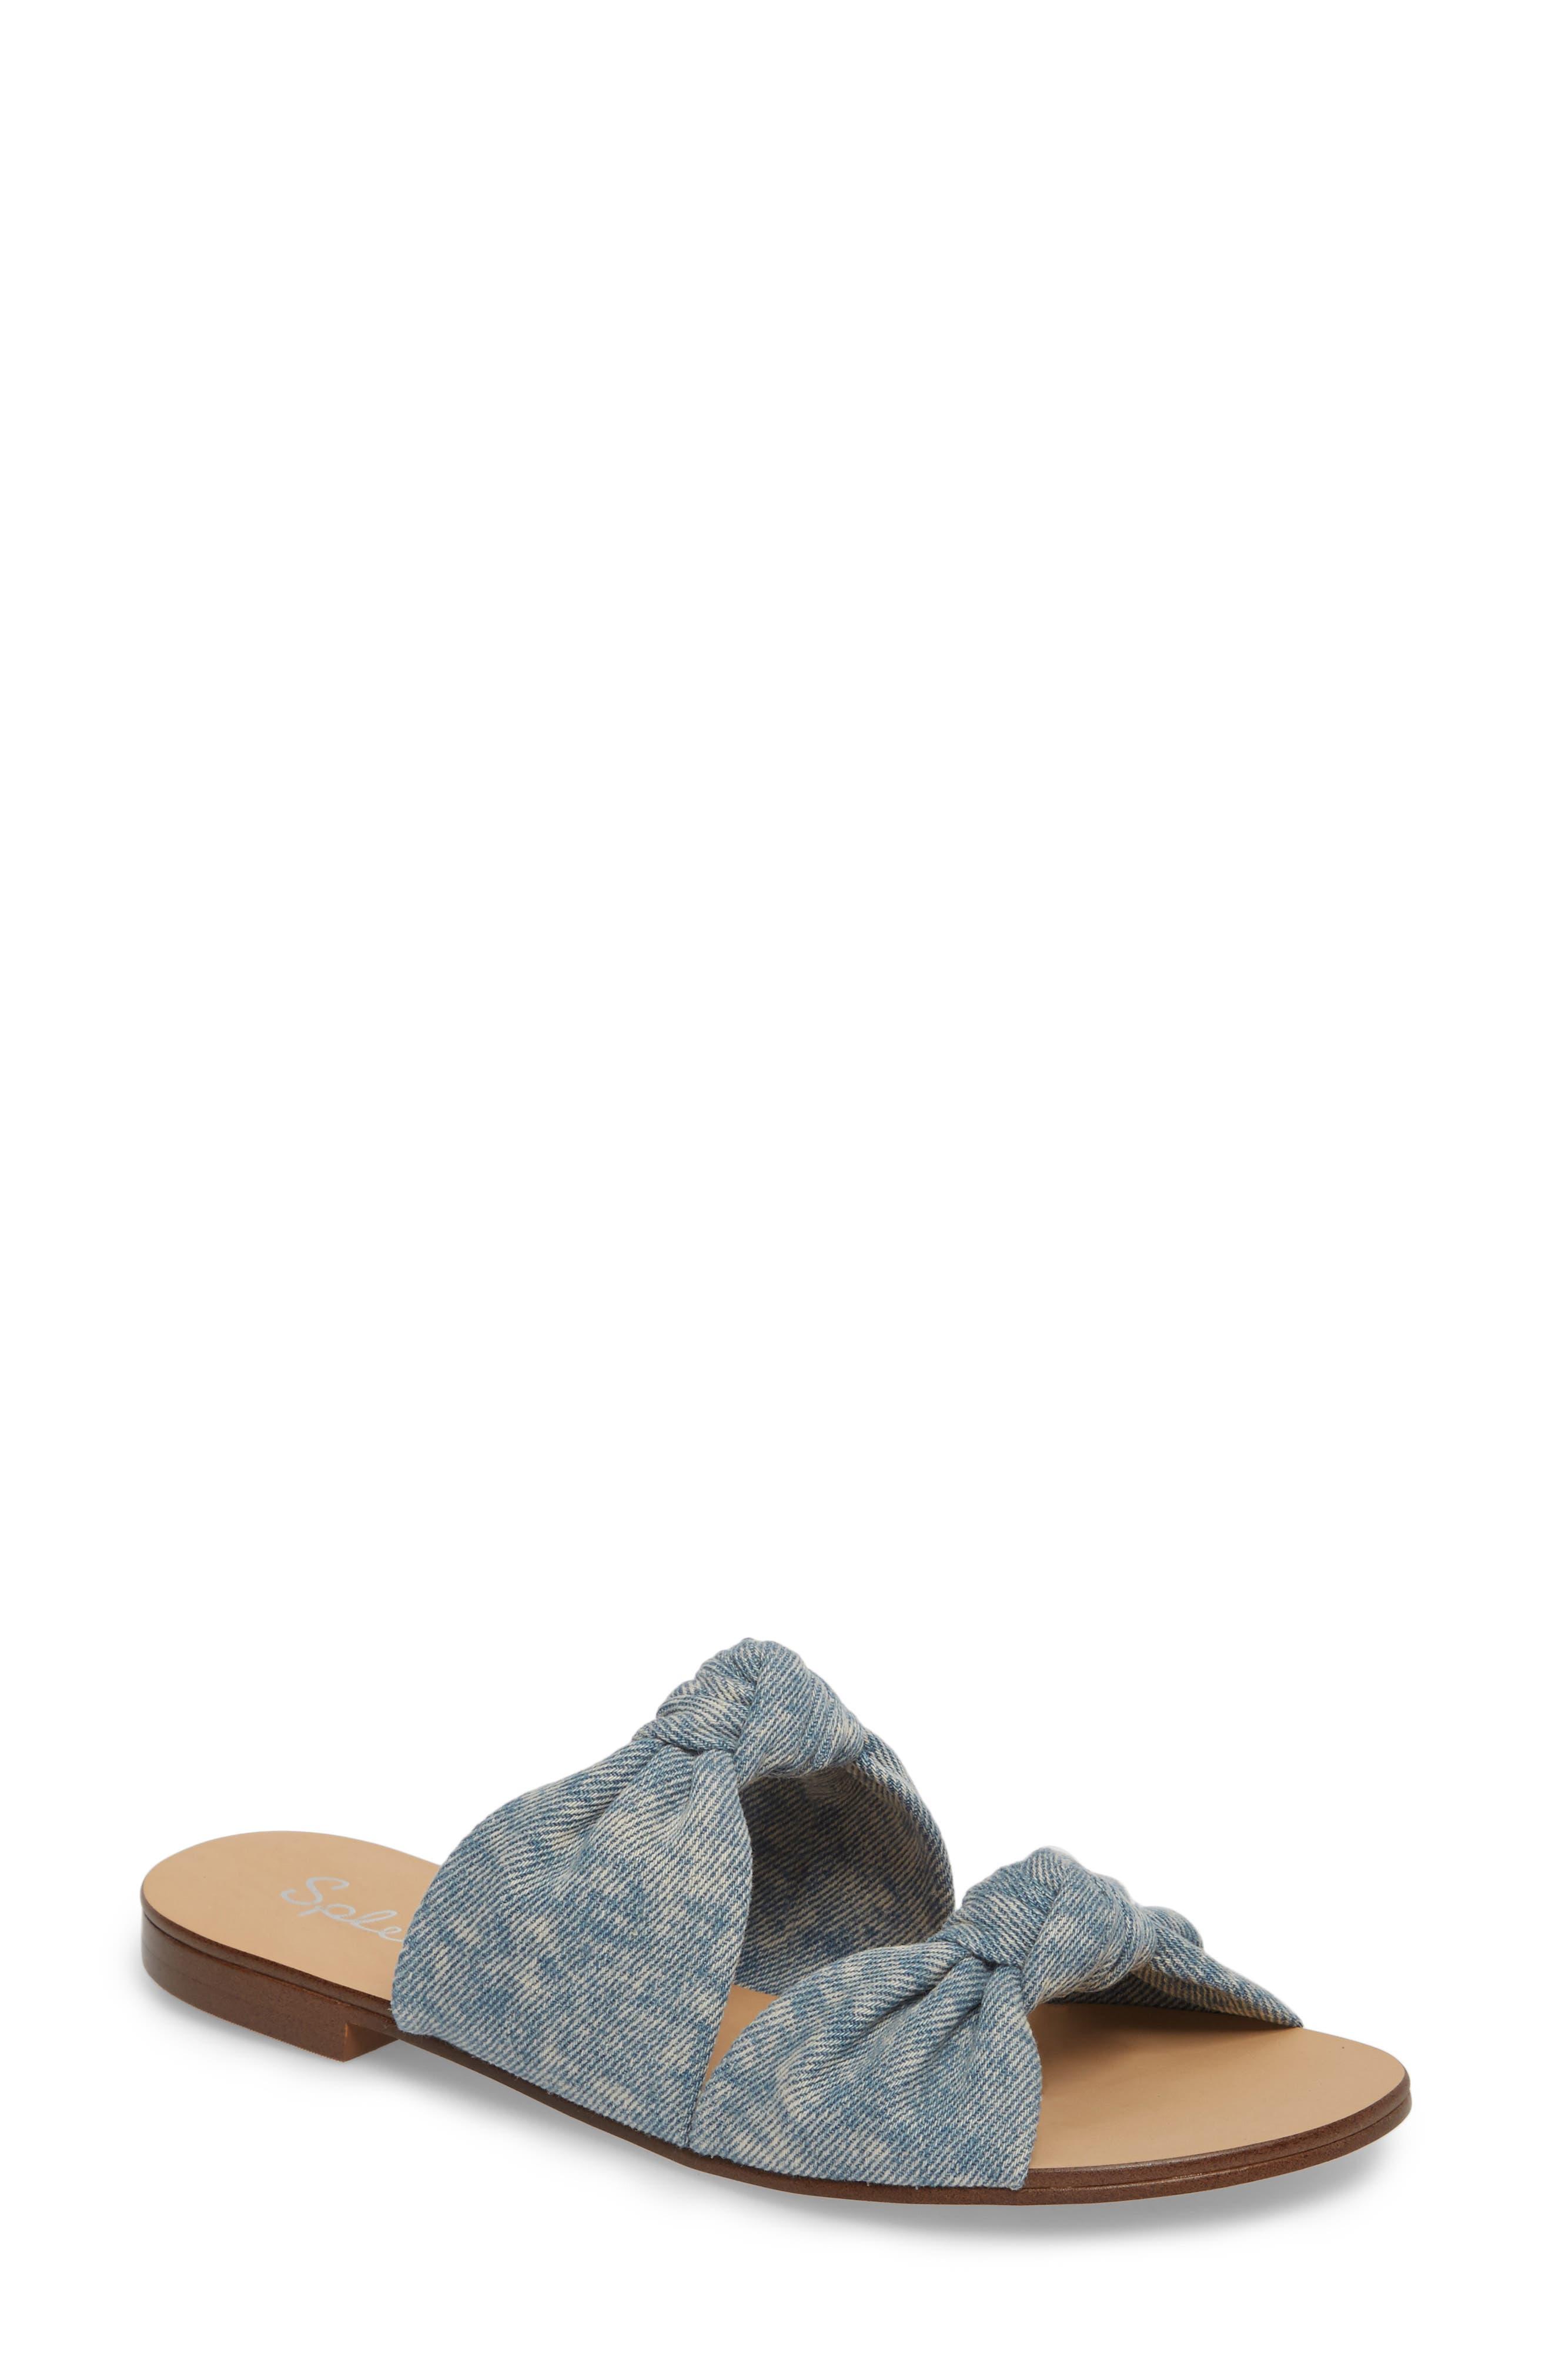 Barton Double Knotted Slide Sandal,                             Main thumbnail 1, color,                             Jean Fabric